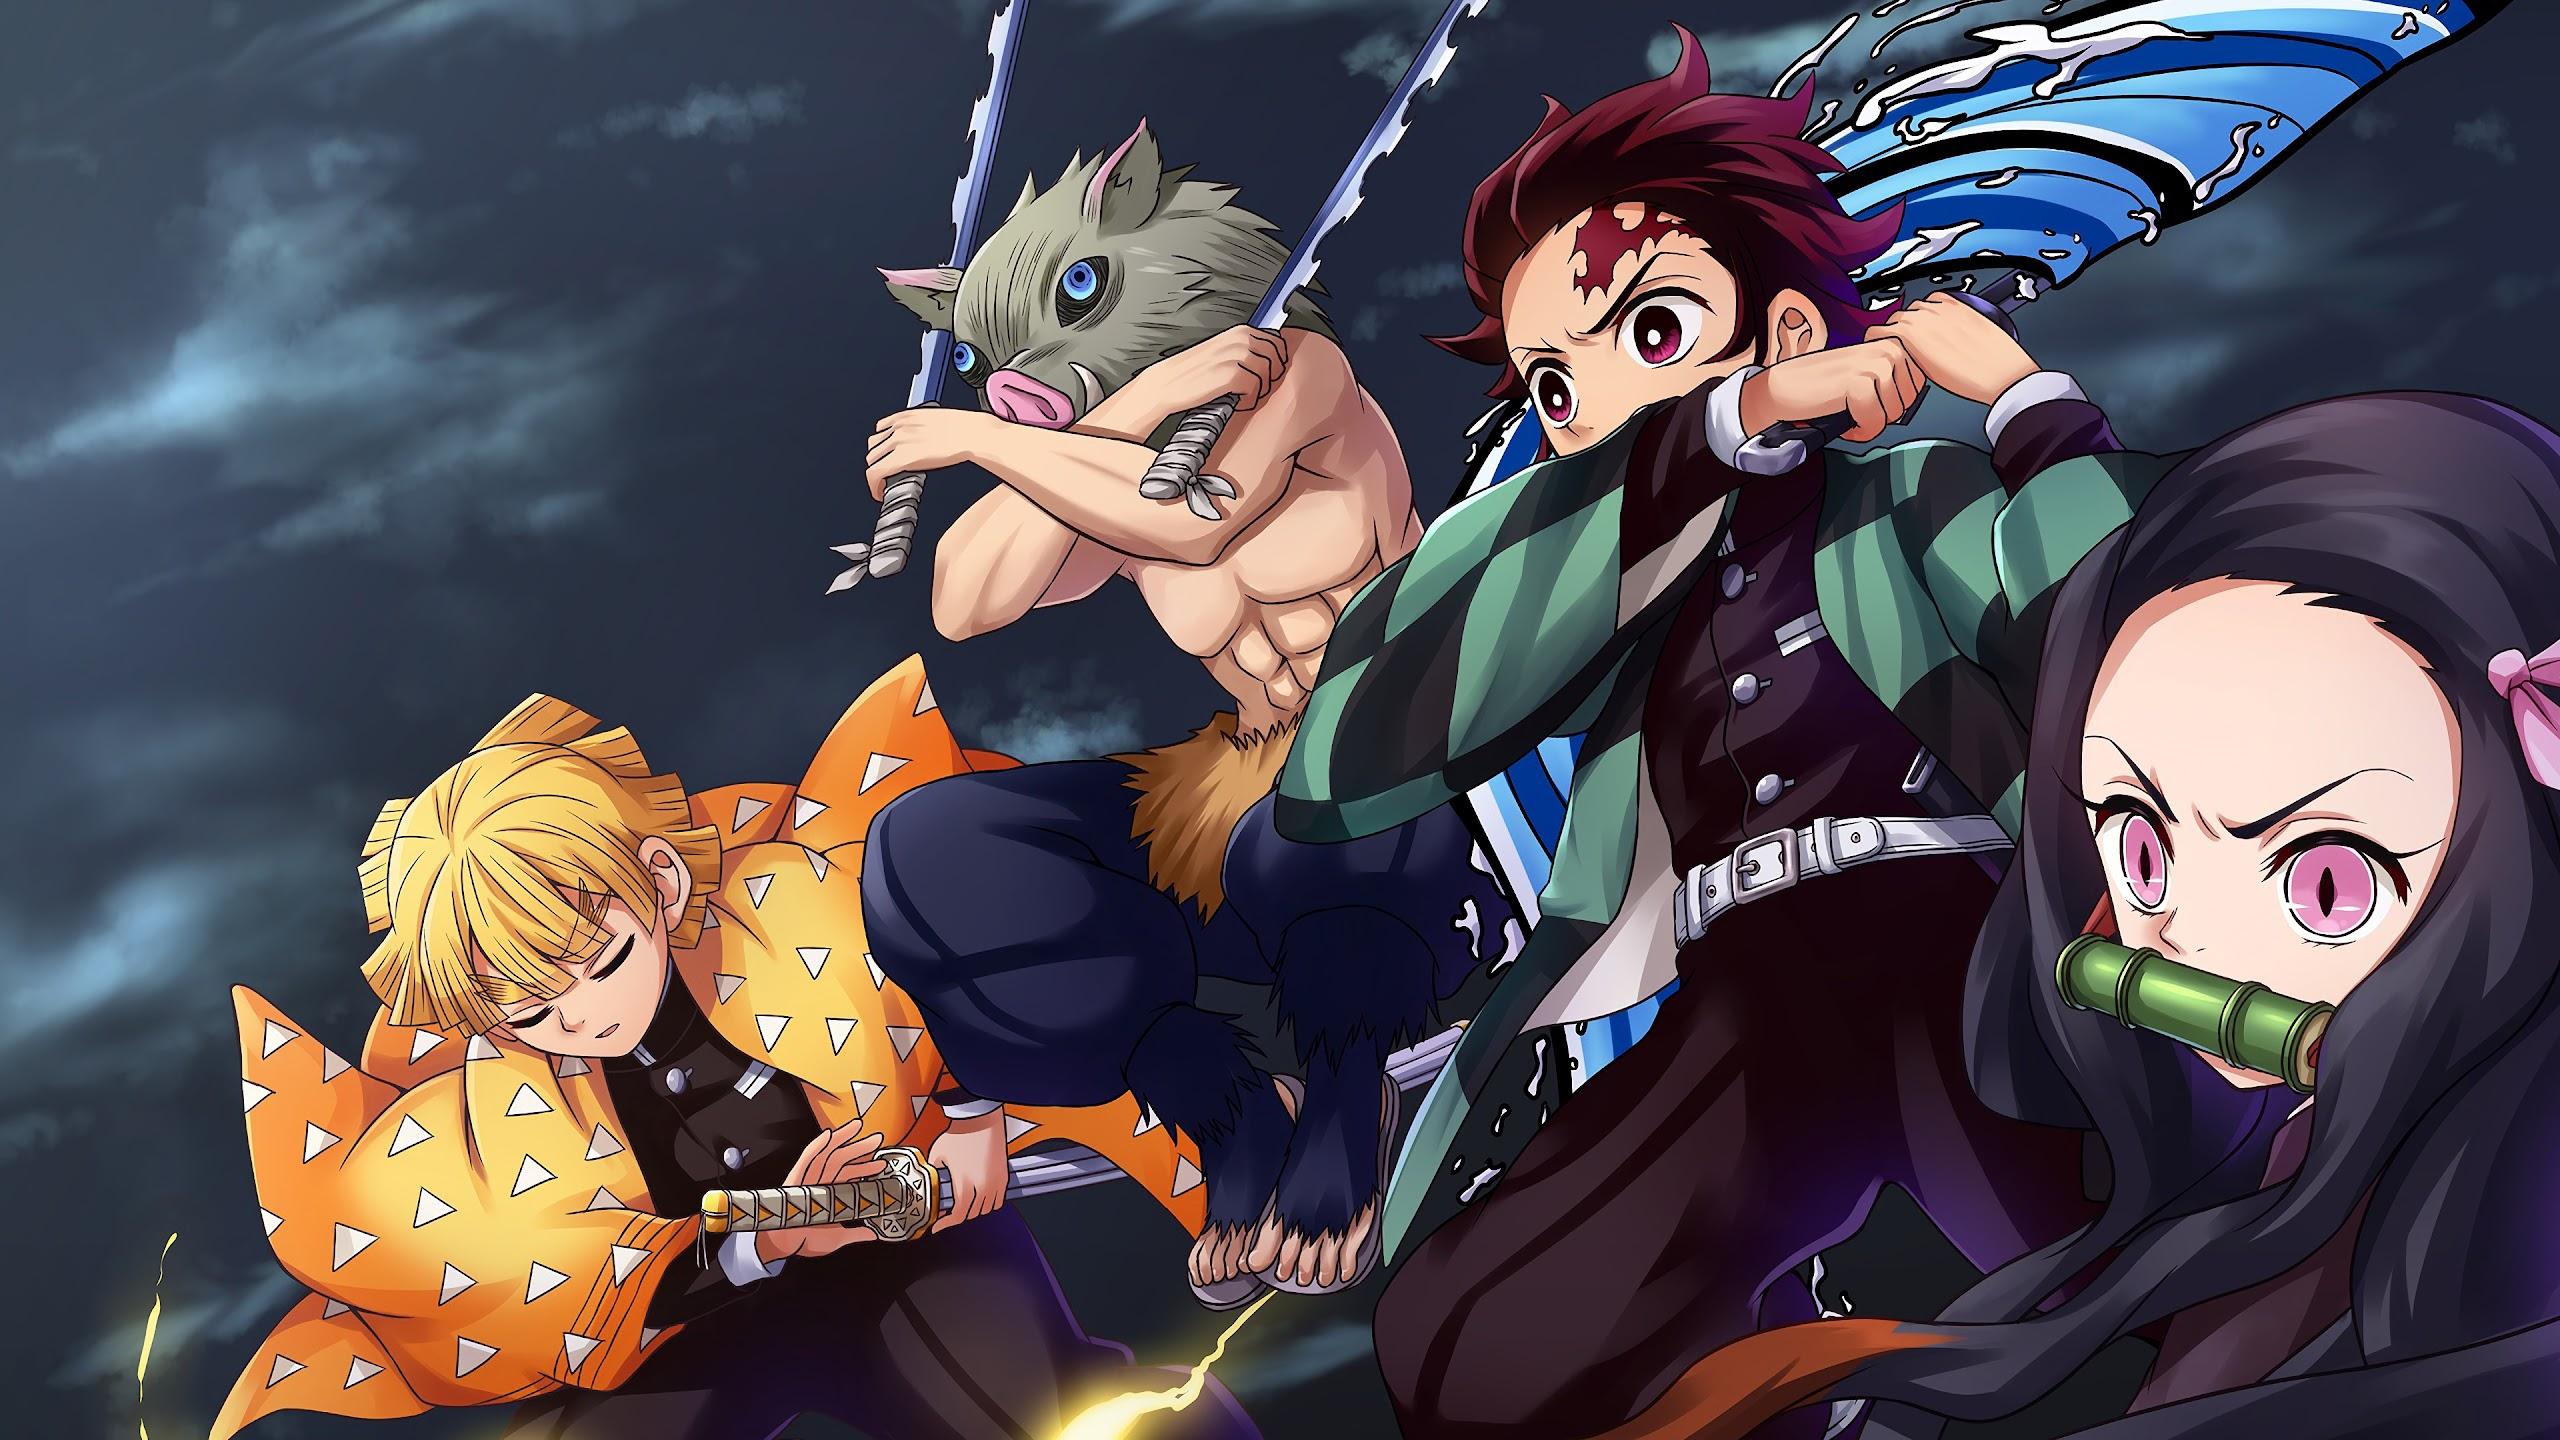 Anime Wallpaper 4k Kimetsu No Yaiba Anime Wallpapers